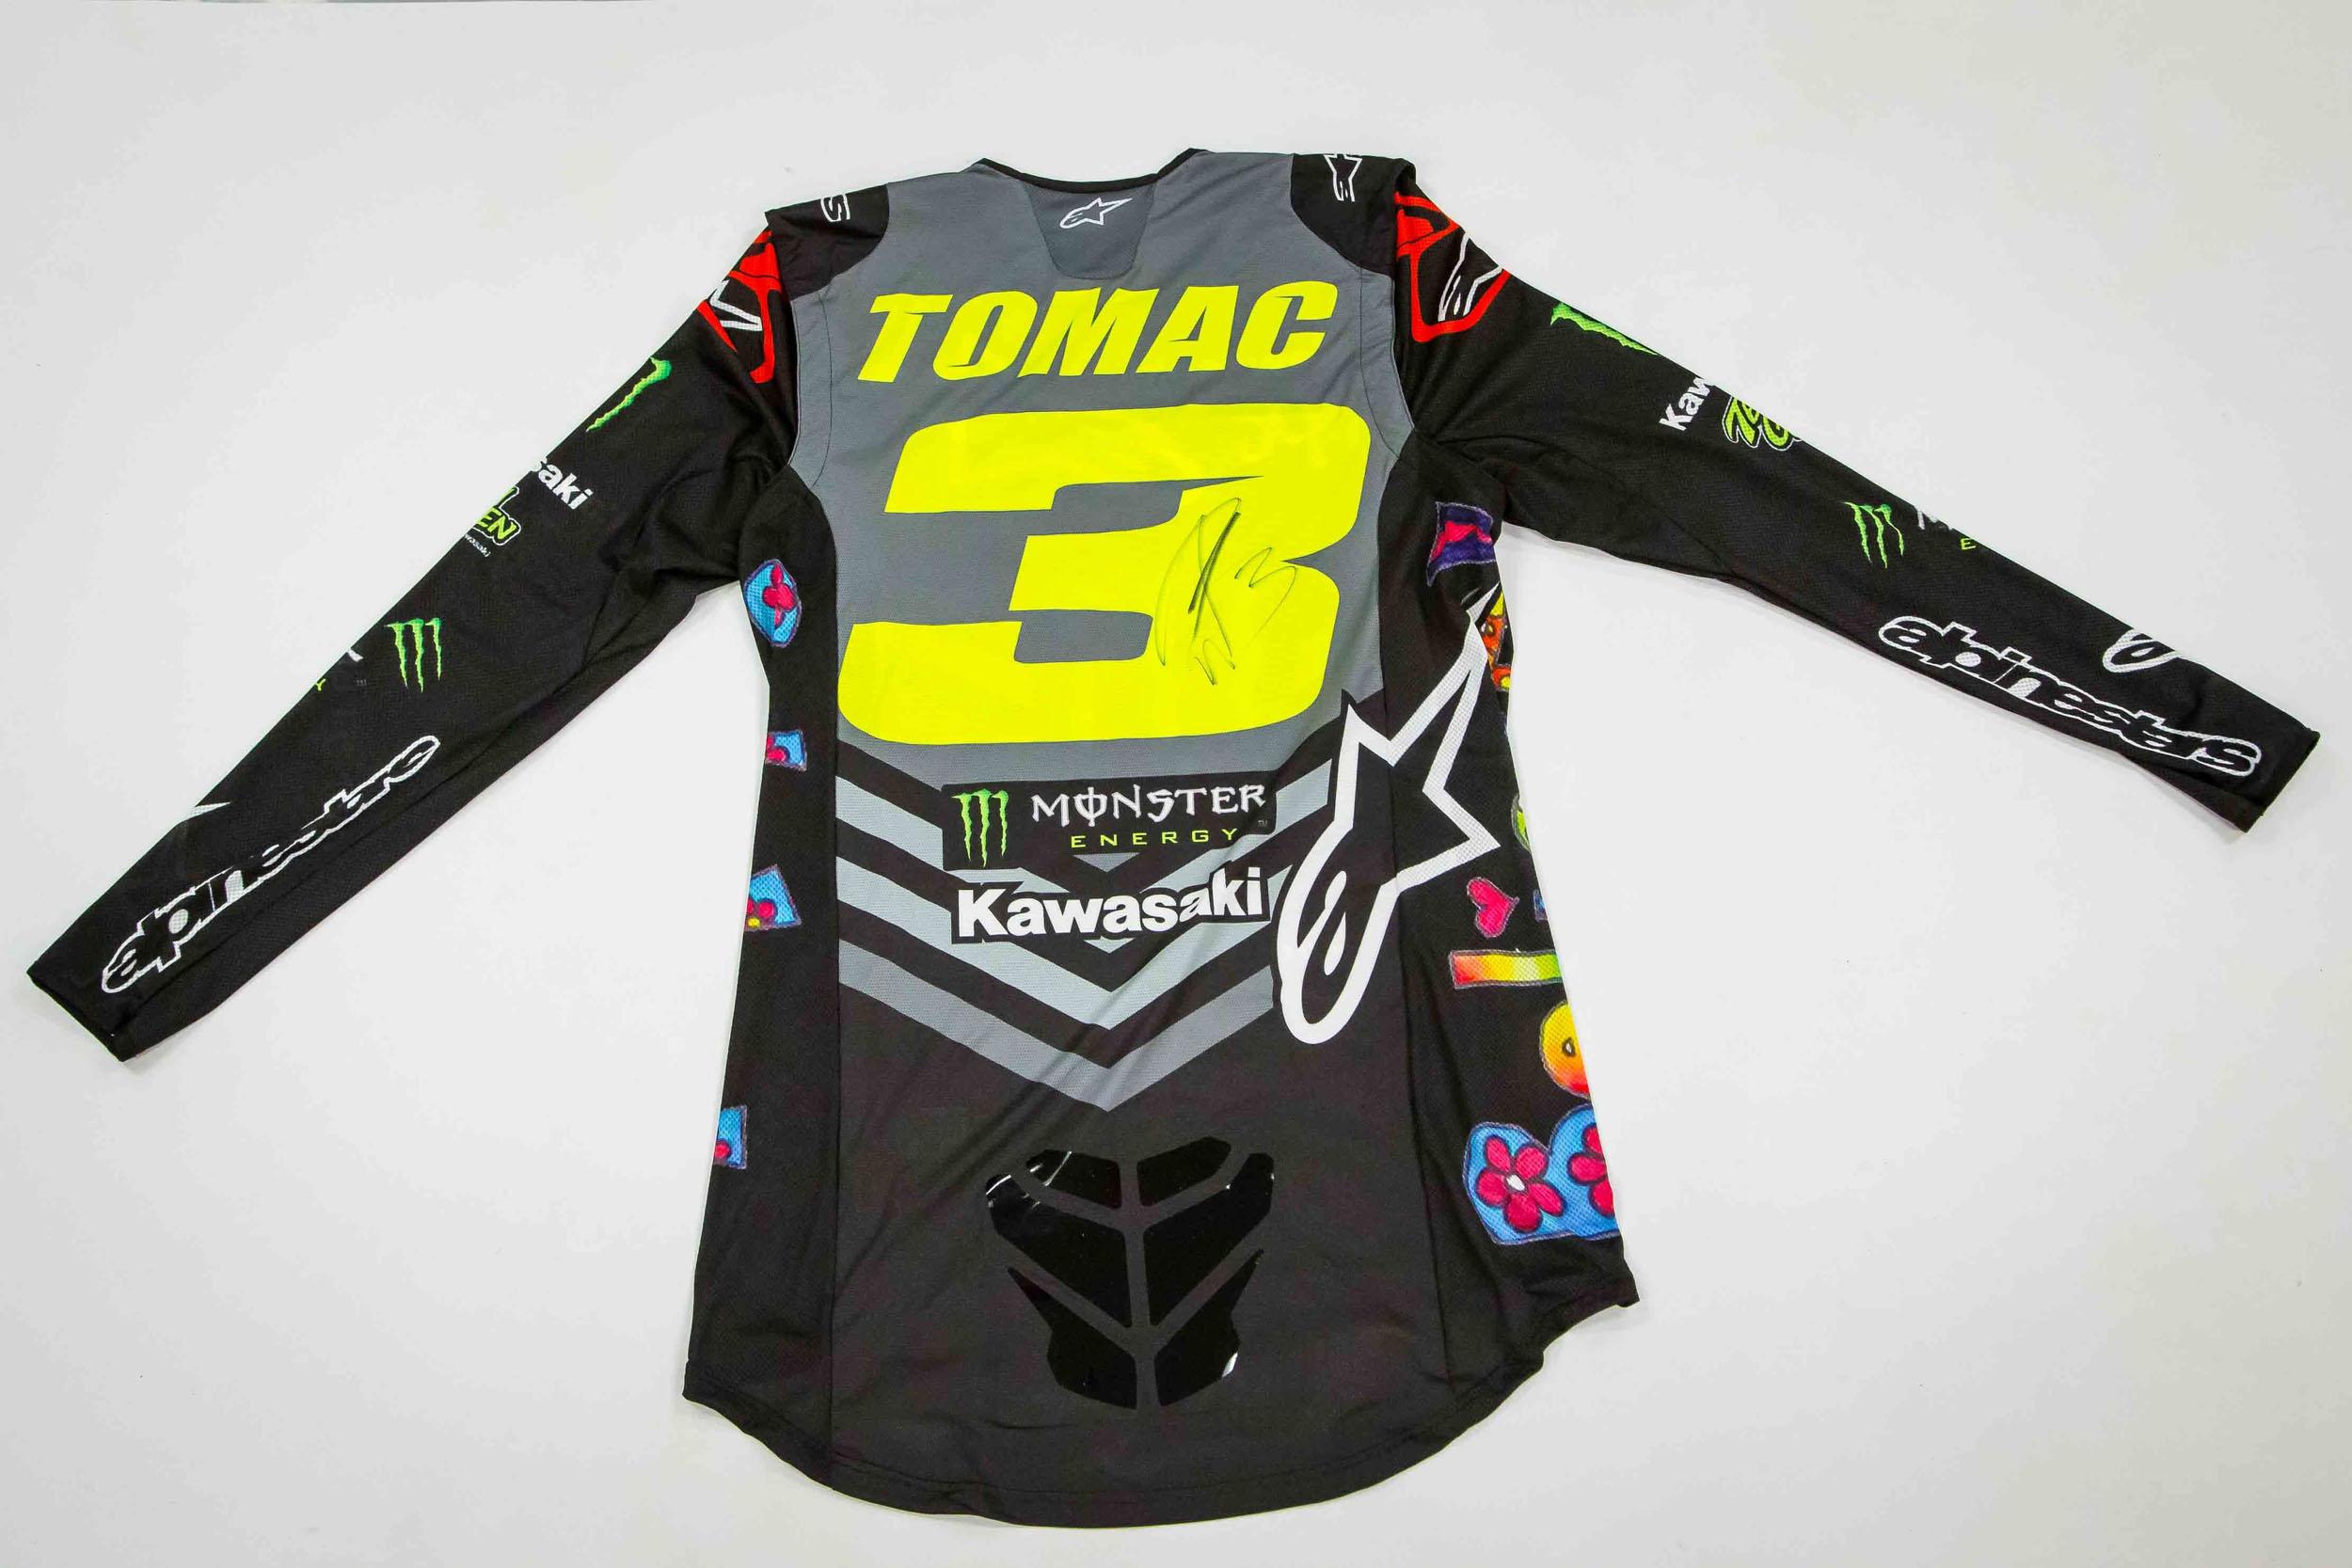 200501 St. Jude - Eli Tomac's race-worn gear